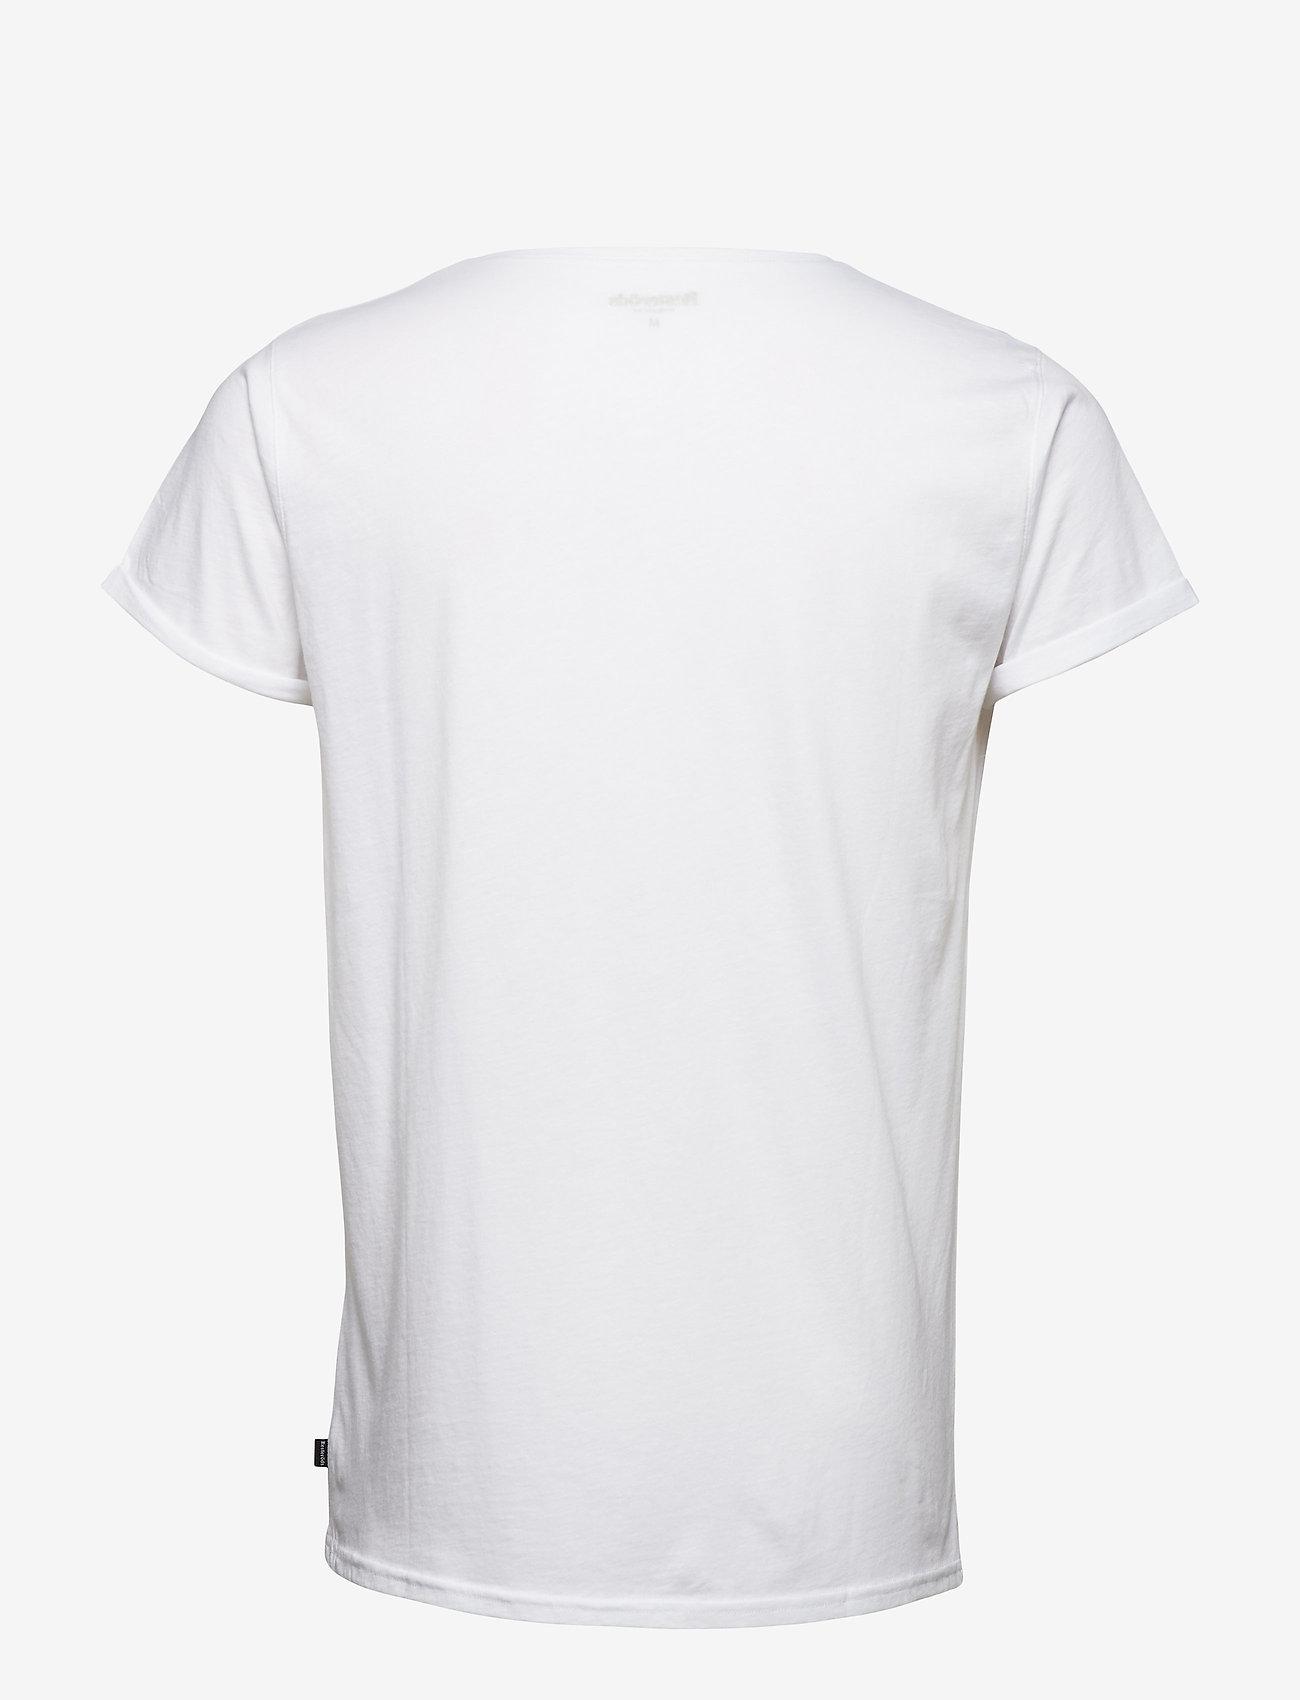 Resteröds - JIMMY SOLID - kortermede t-skjorter - white - 1